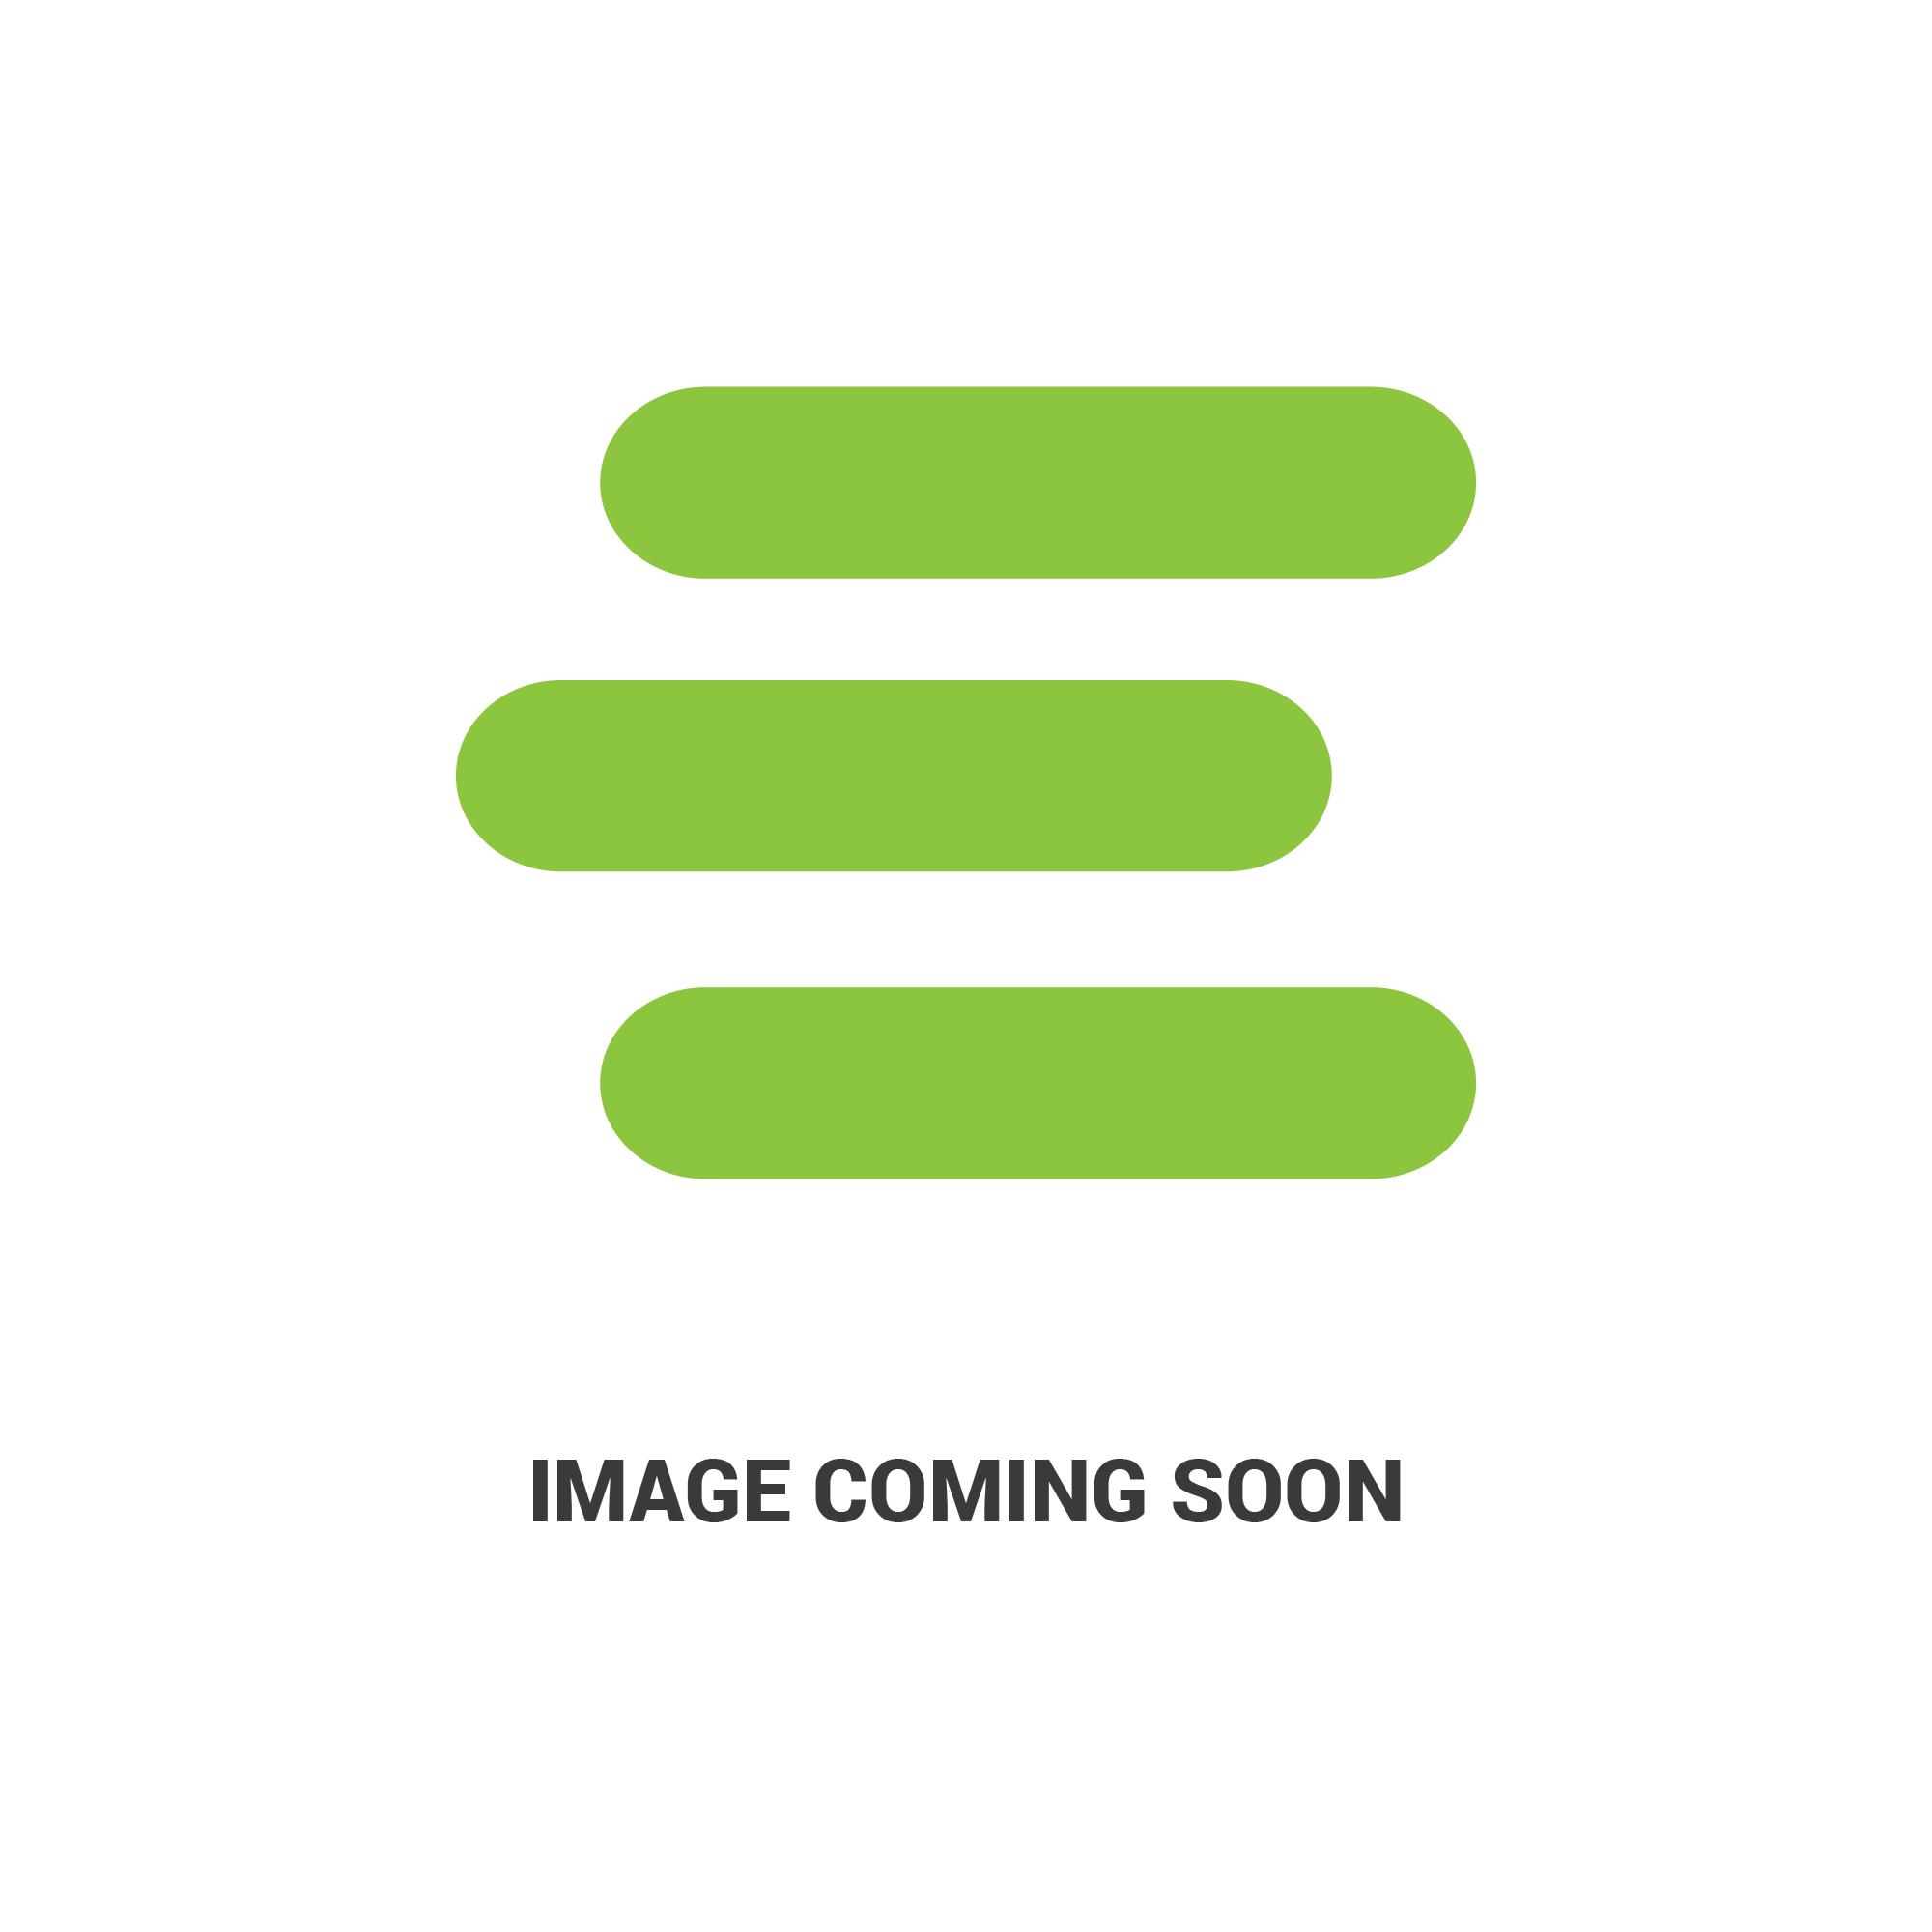 E-LP05edit 1.jpg